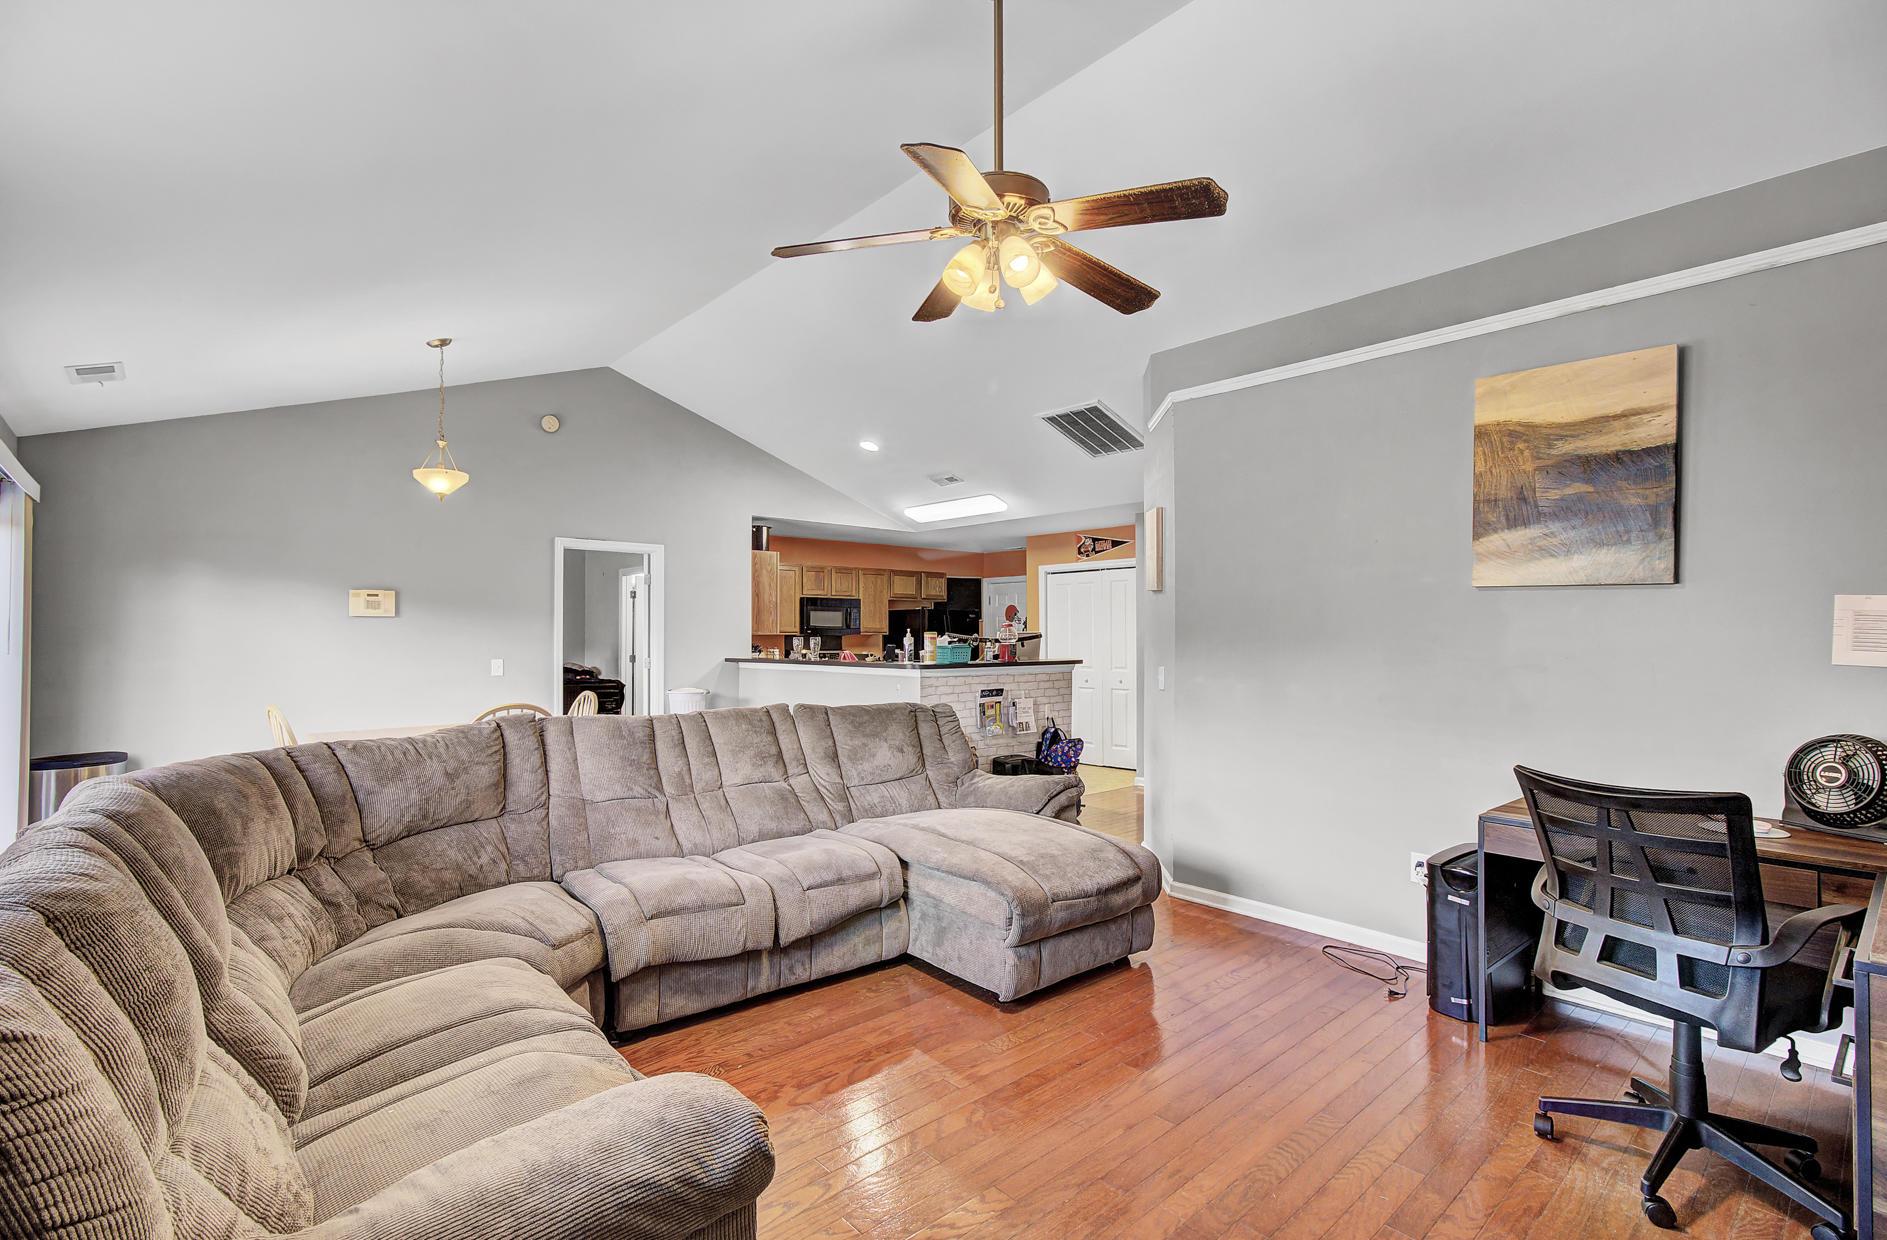 Oakley Pointe Homes For Sale - 231 Silk Oak, Moncks Corner, SC - 2